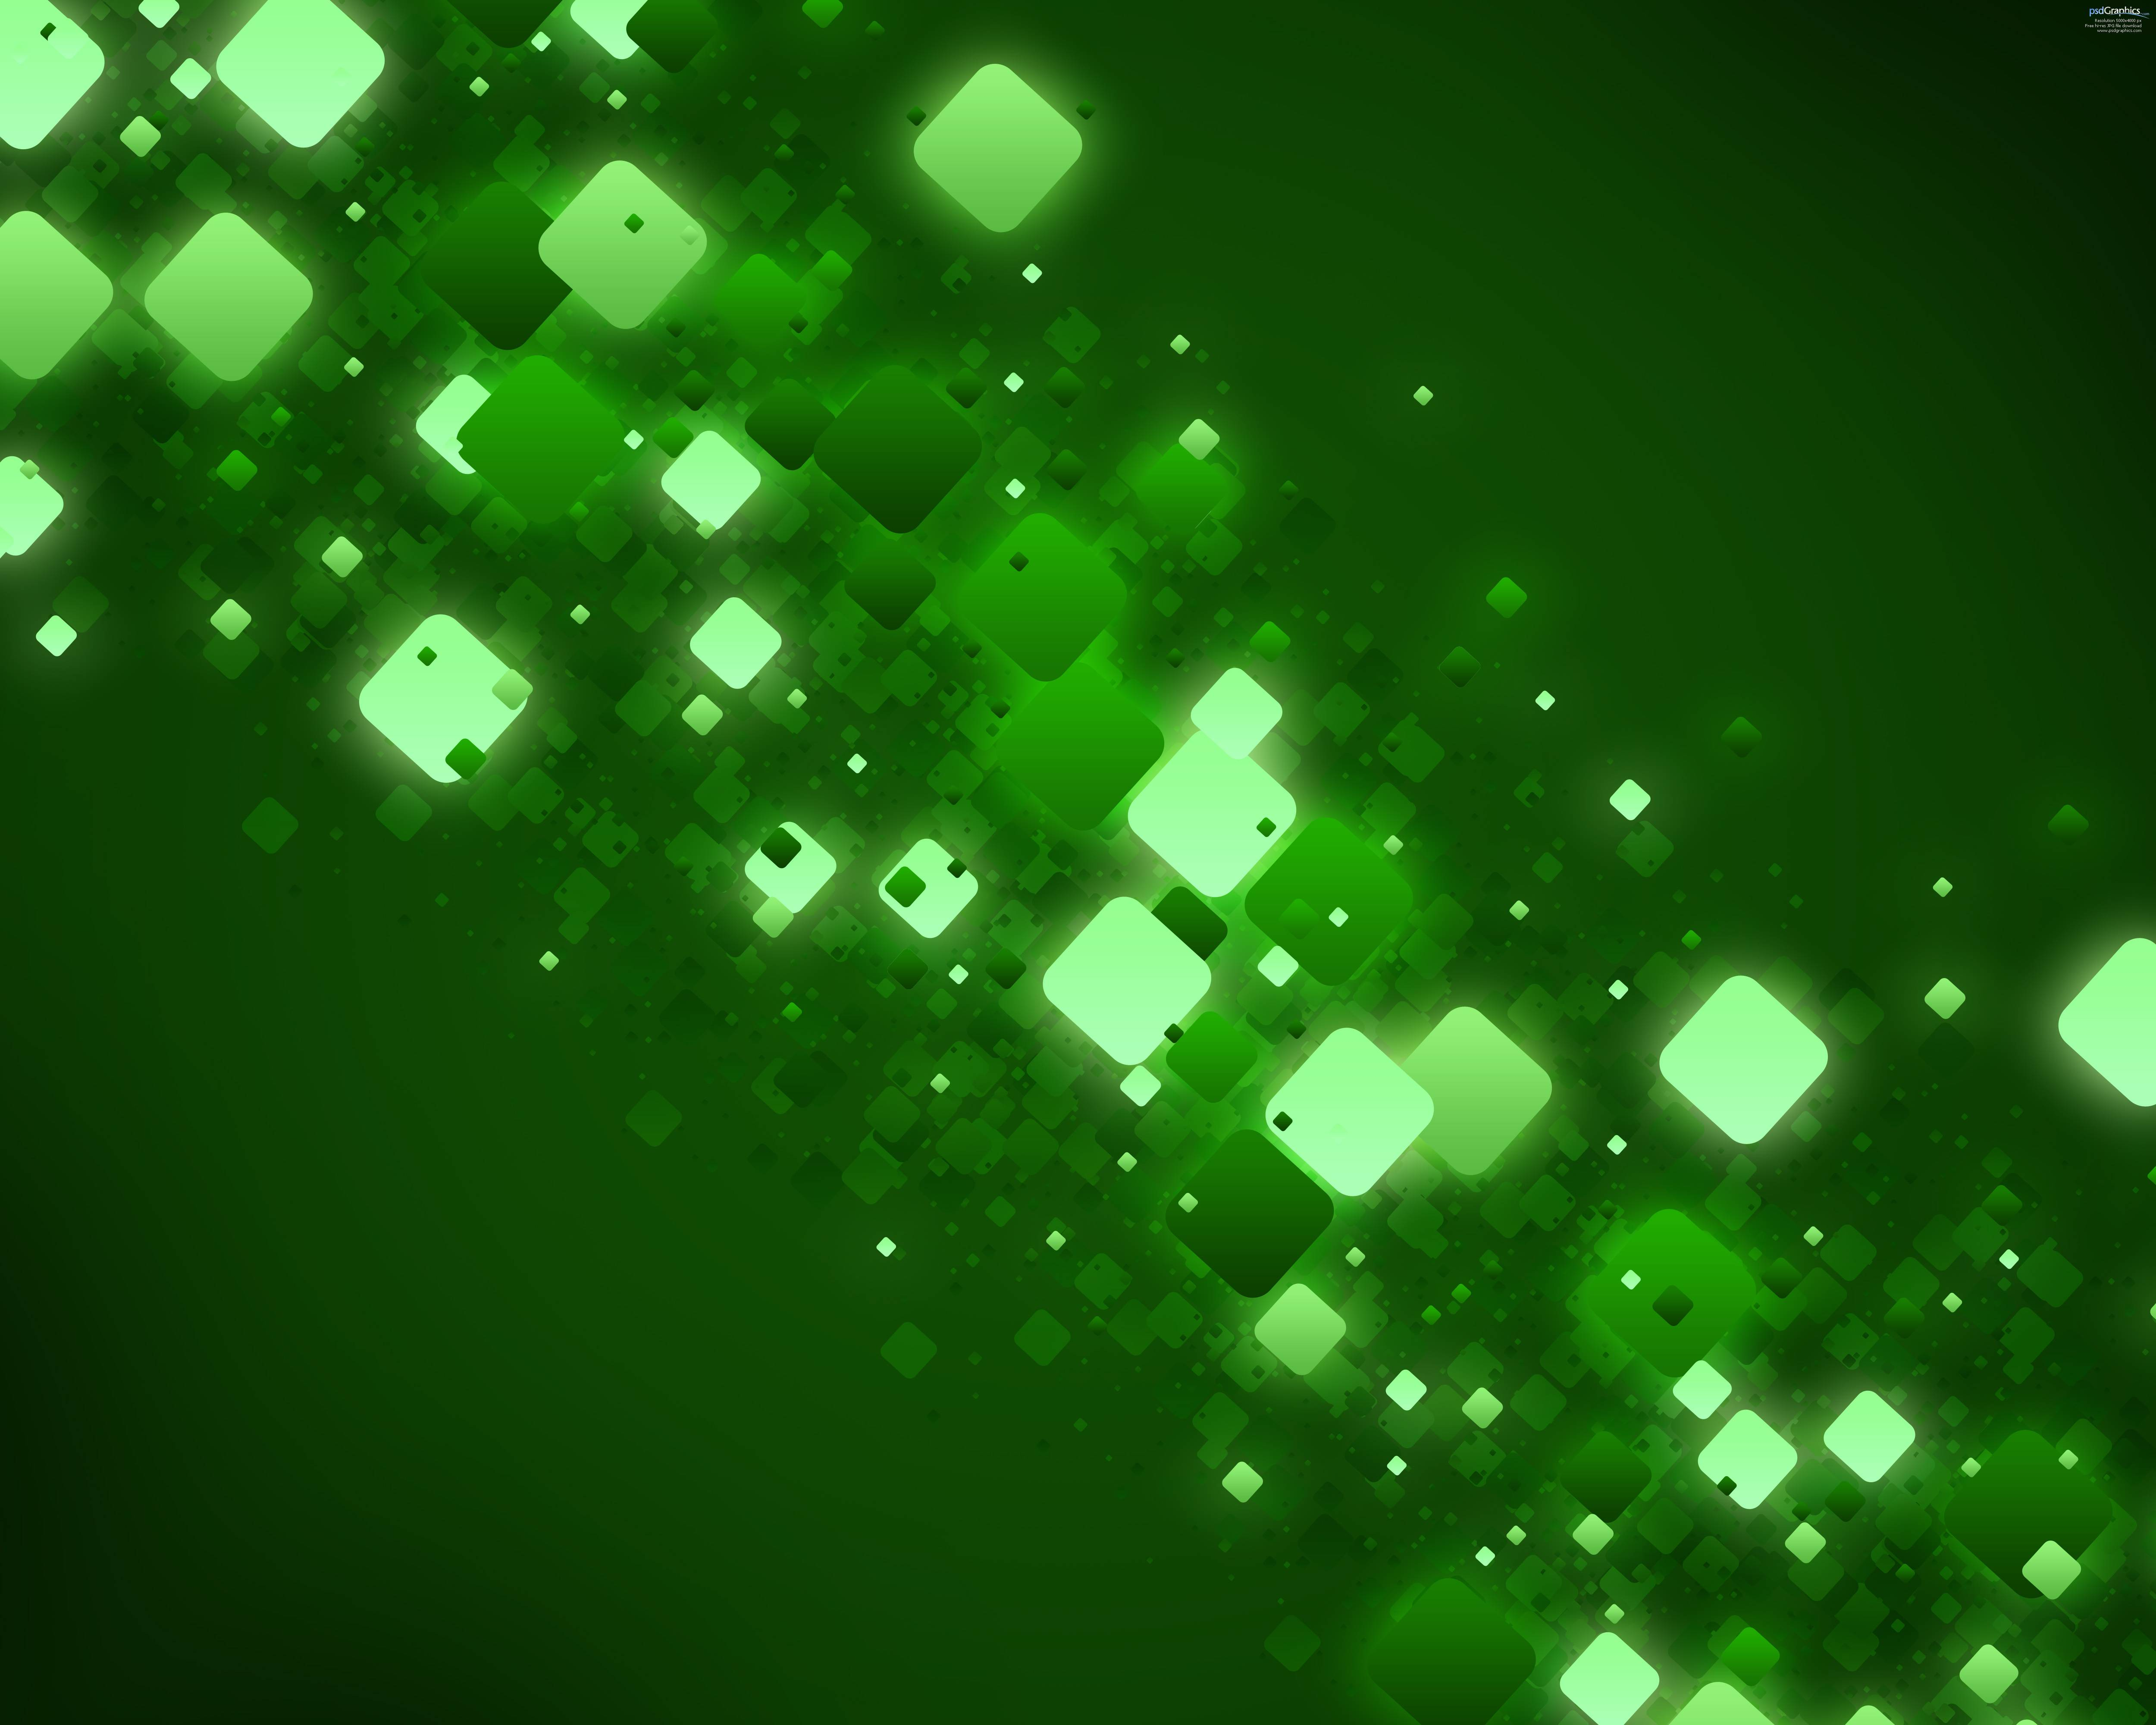 Dark Green Background Wallpaper: Dark Green Backgrounds